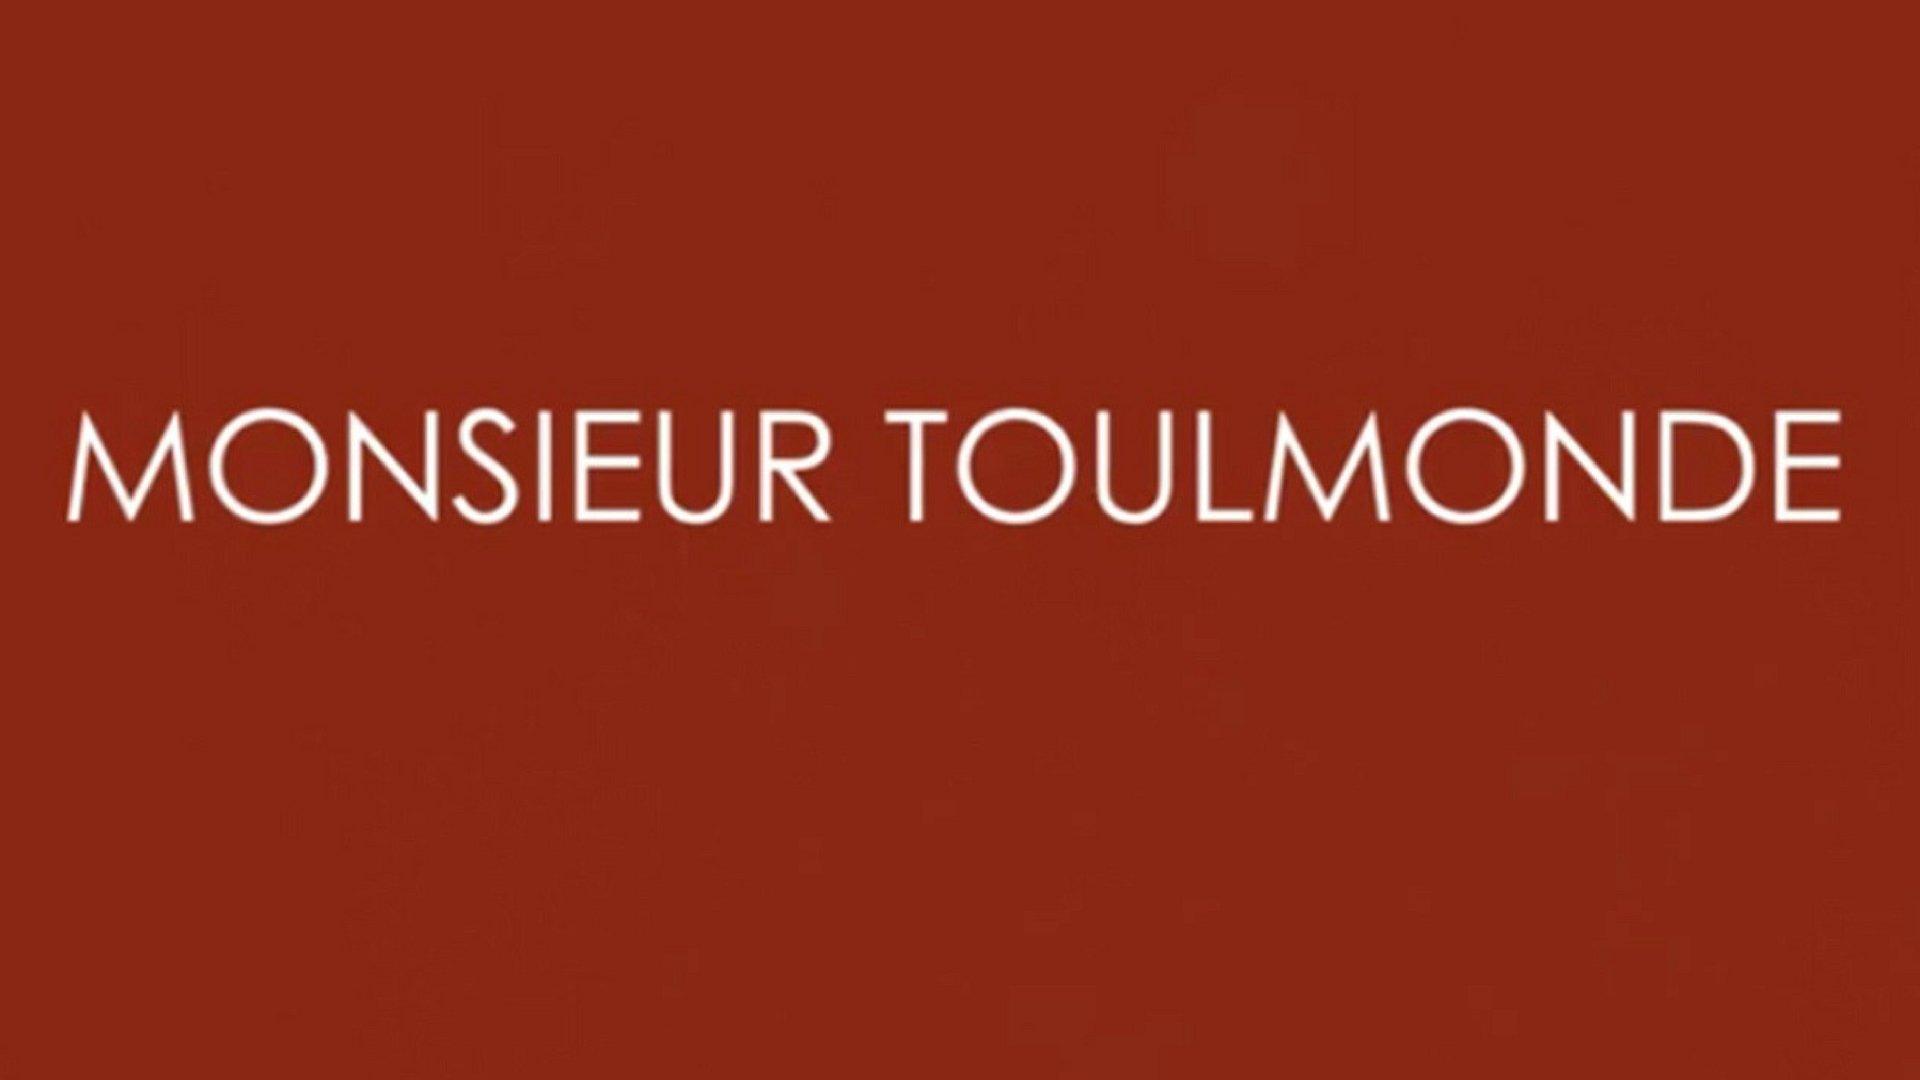 aldebert monsieur toulmonde mp3